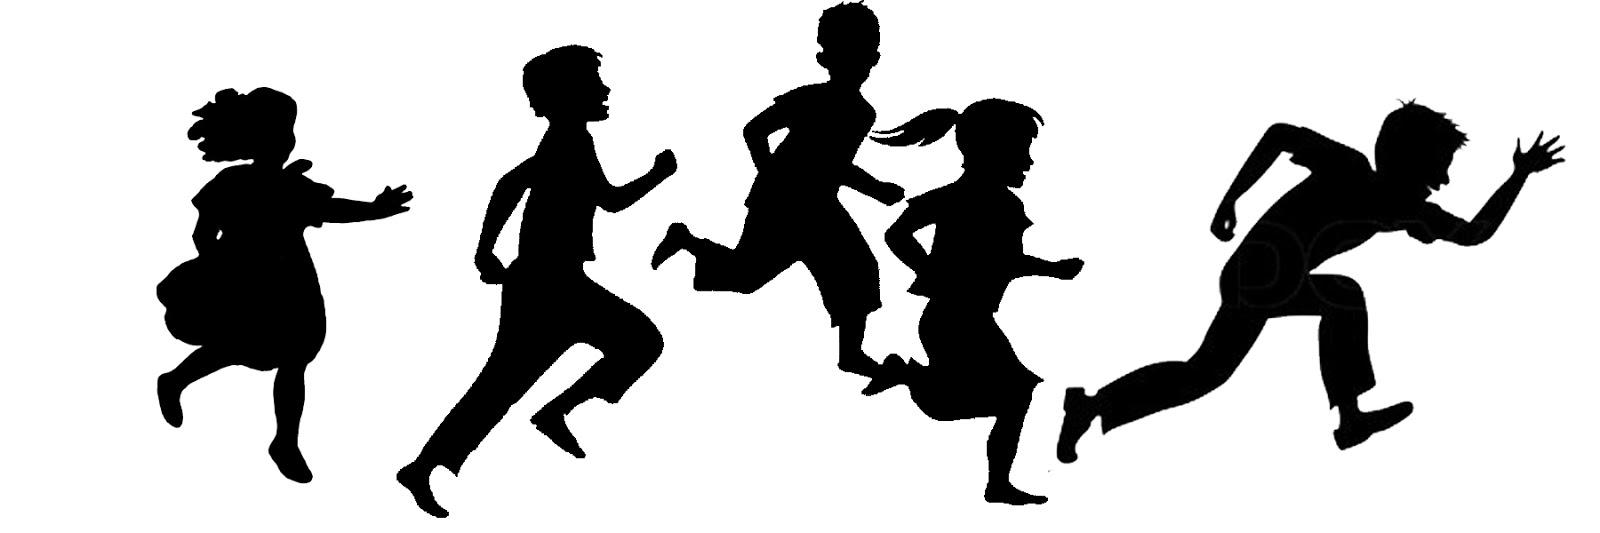 family running clipart - photo #40